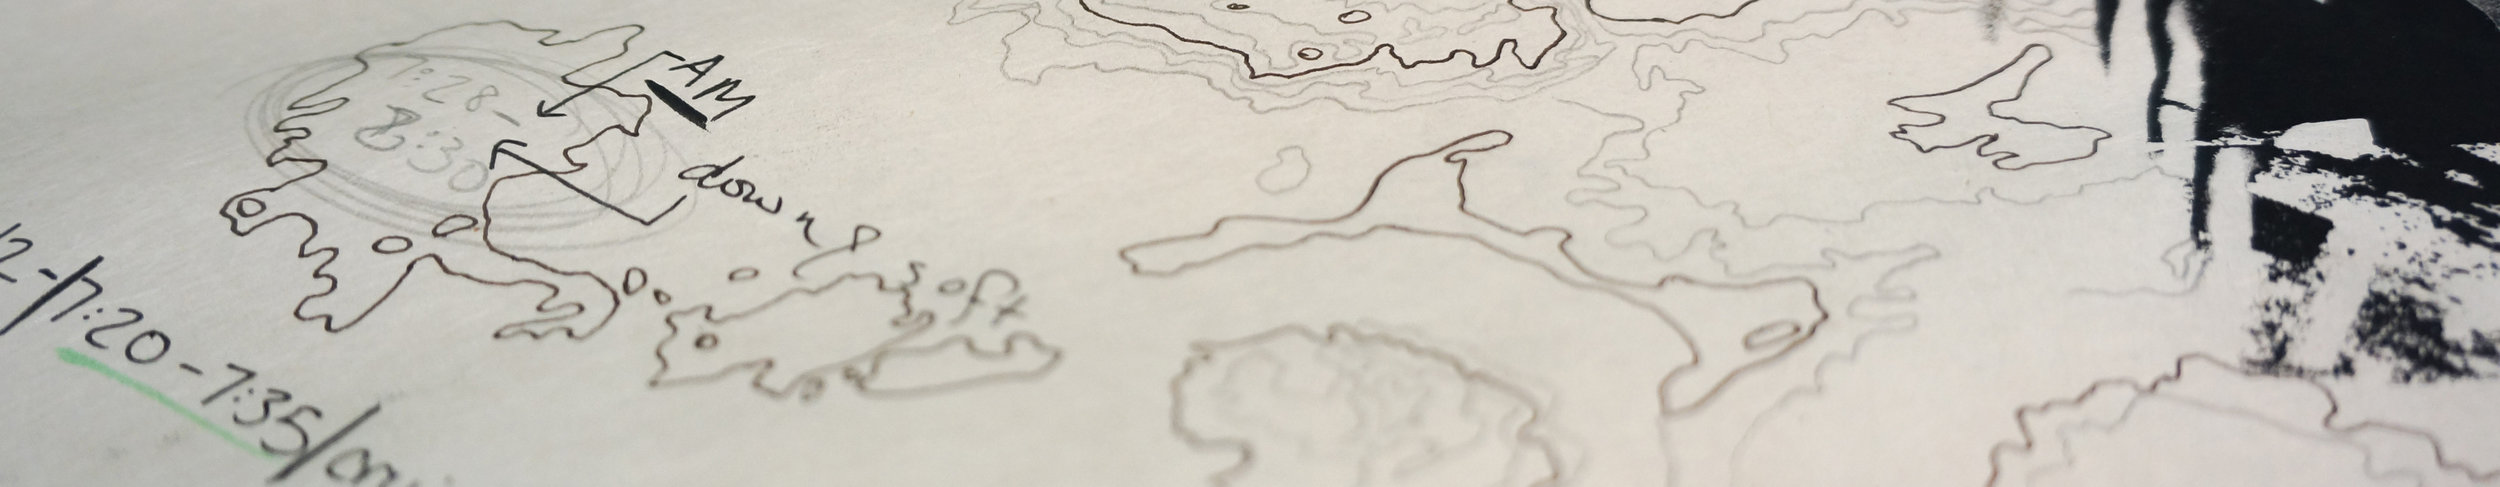 Manifold Landscapes, drawing, 2018-2019.